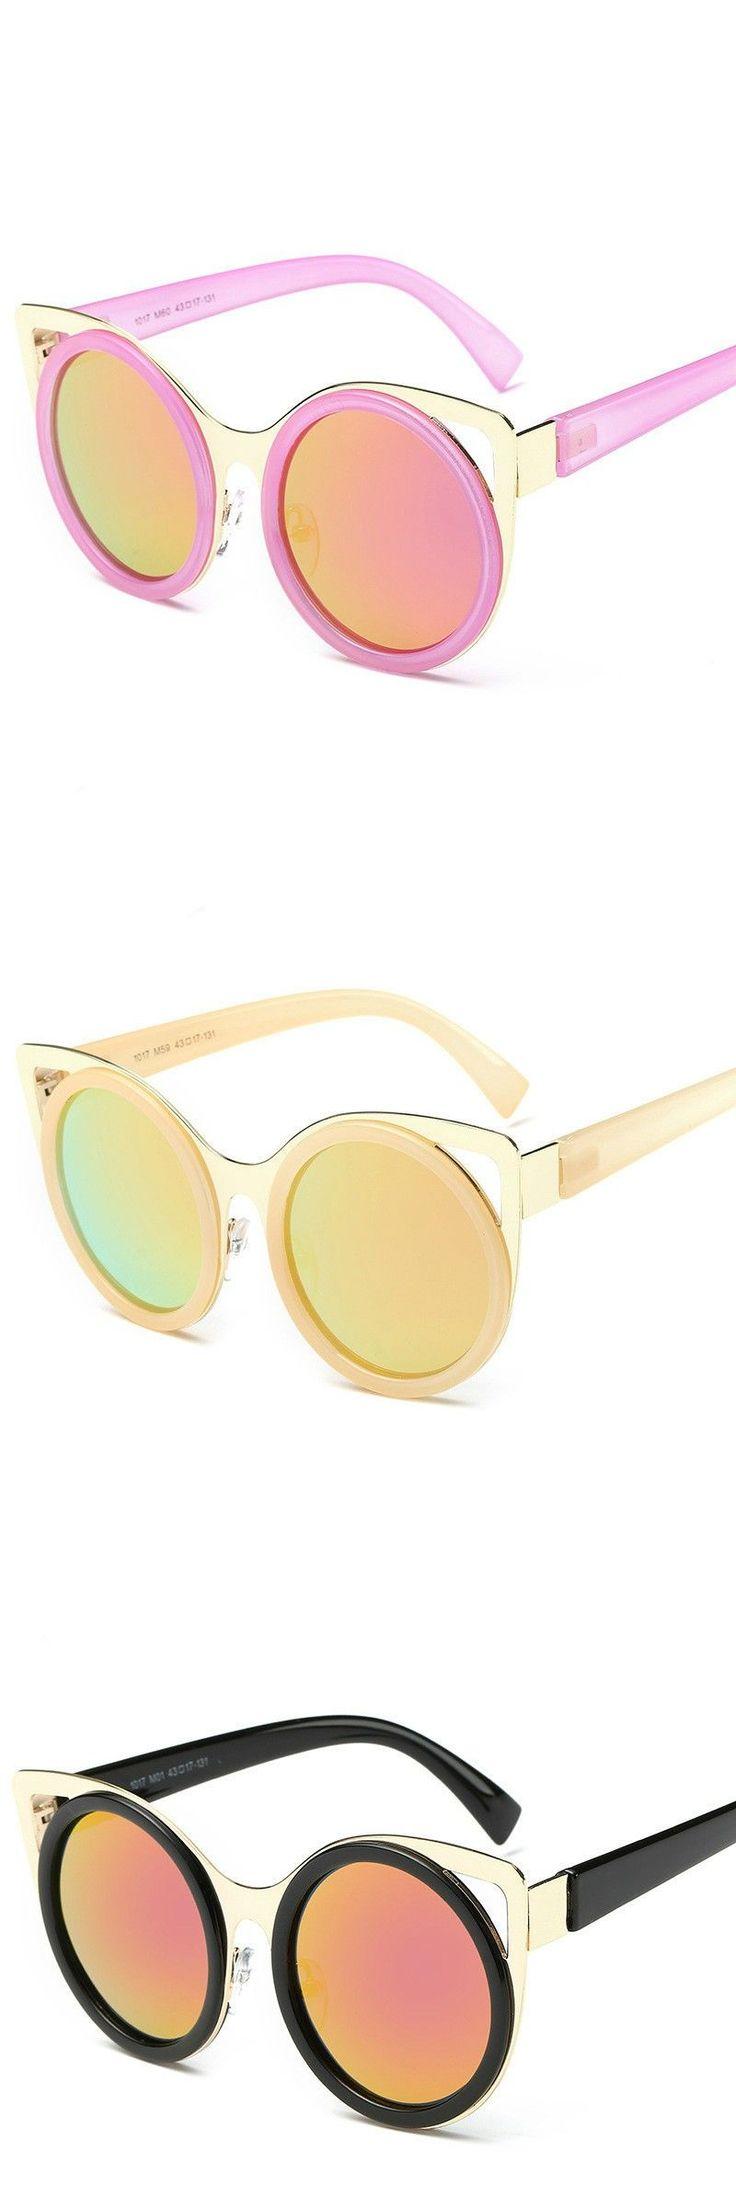 2016 new Lovely cat ears fashion child Polarized sunglasses kids boy girl sun glasses children UV400 As criancas oculos de sol